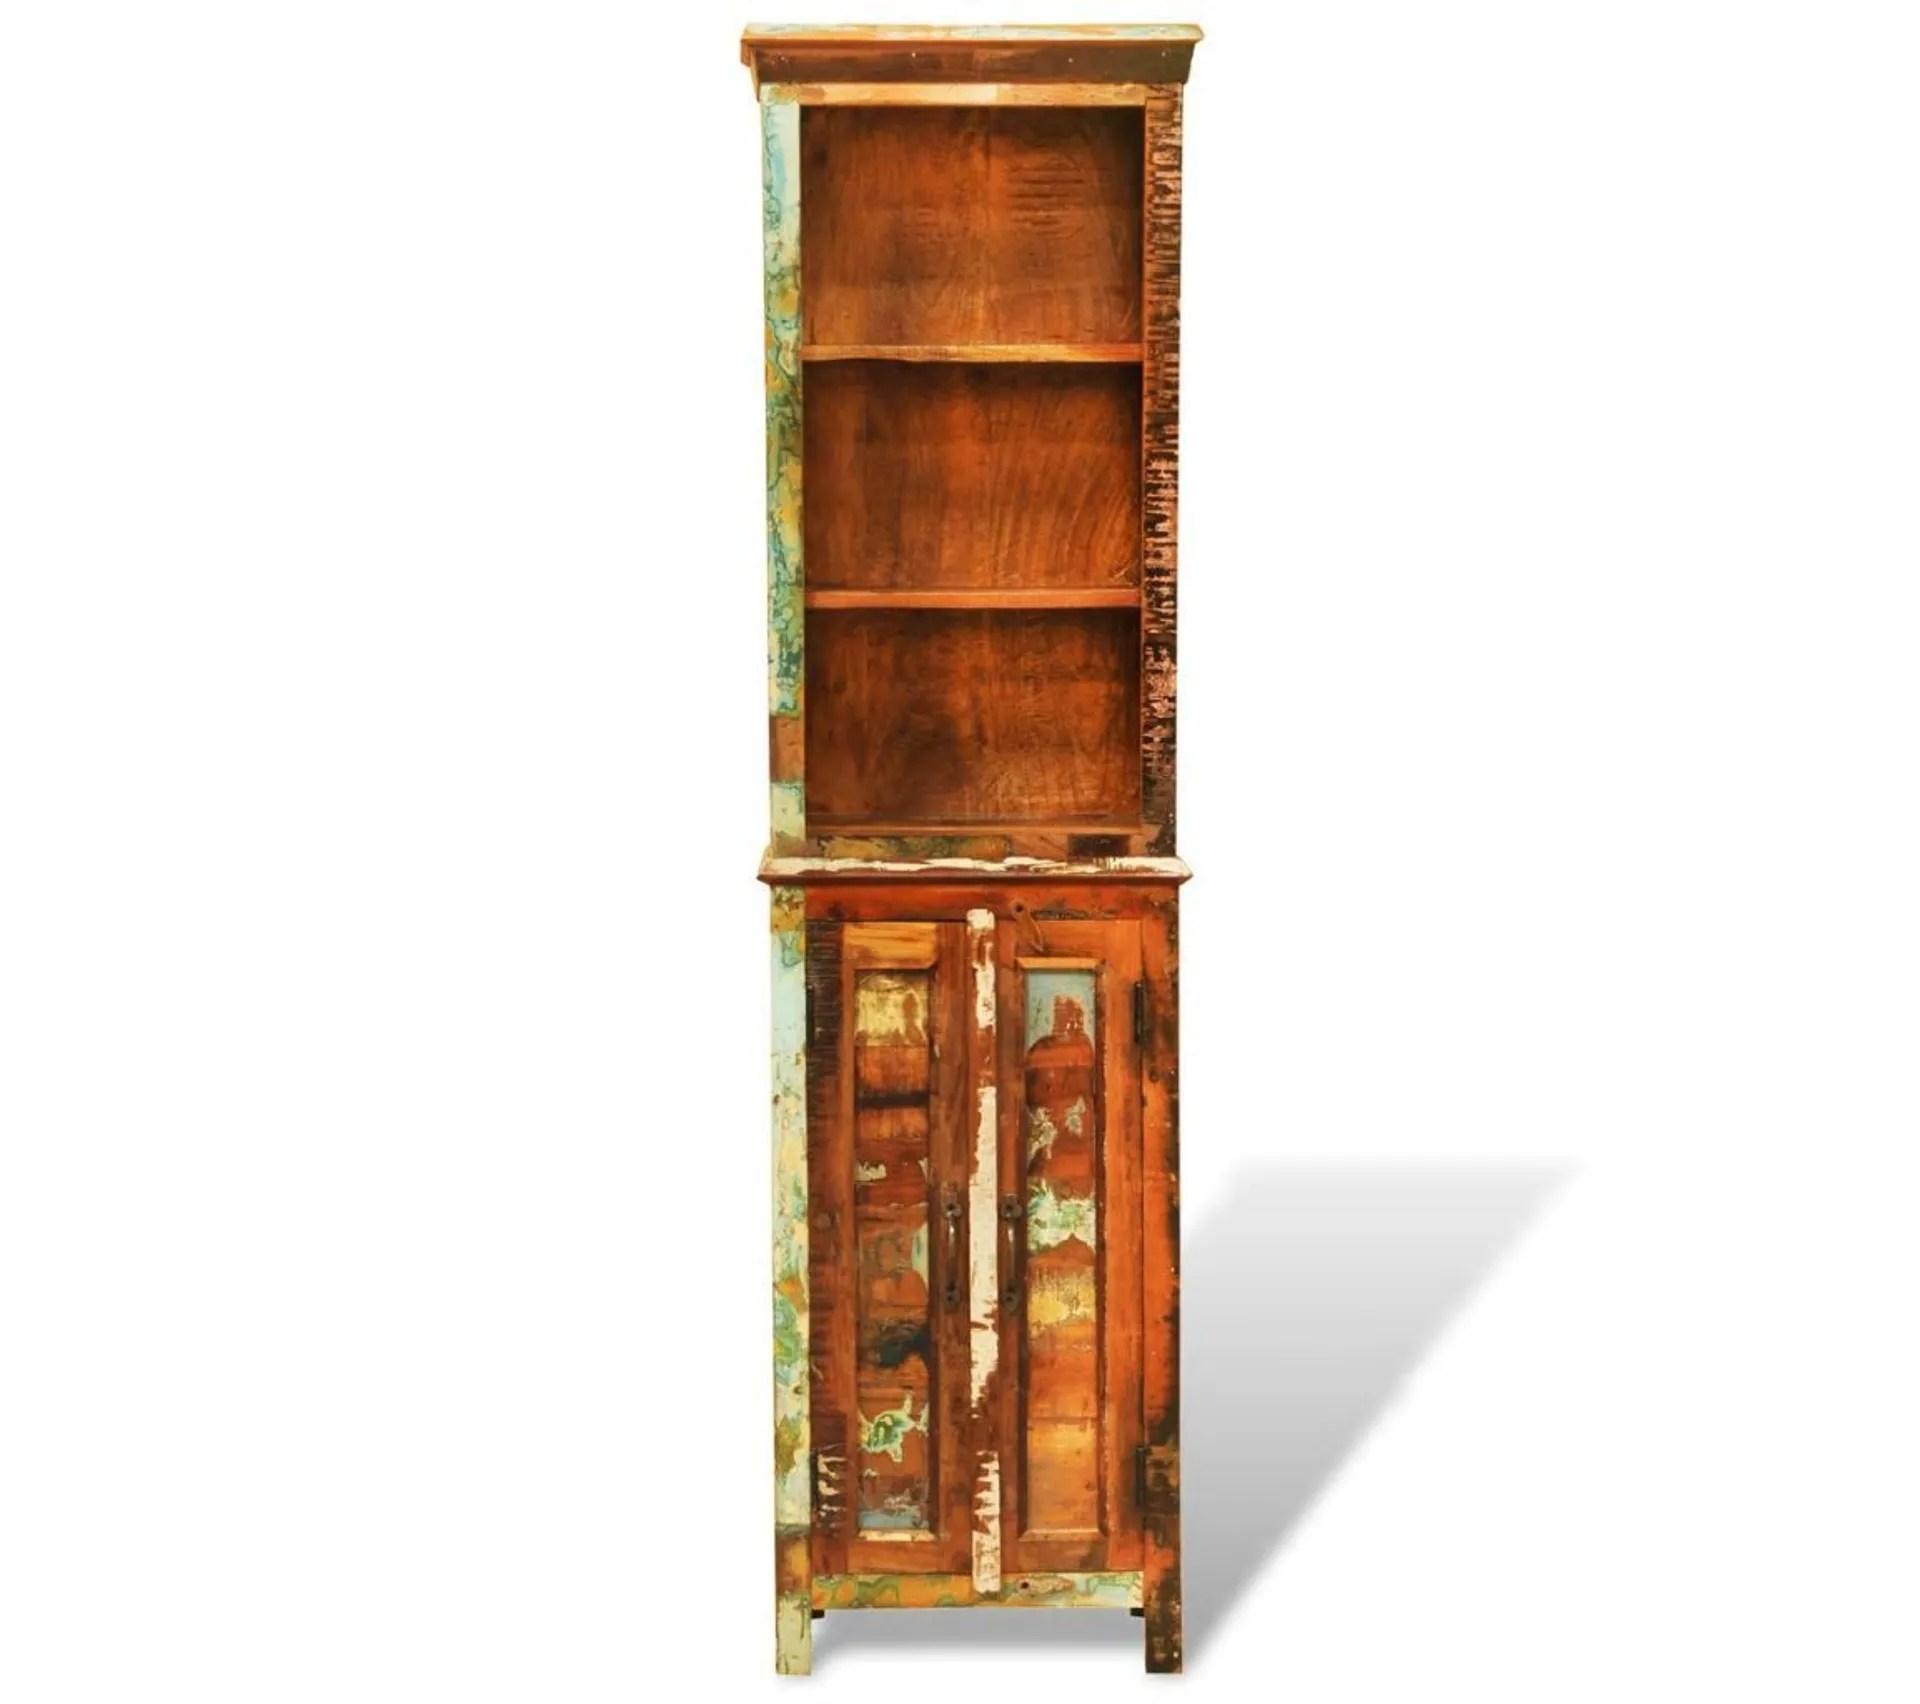 etagere armoire meuble design bibliotheque en bois recycle style vintage 2702009 2